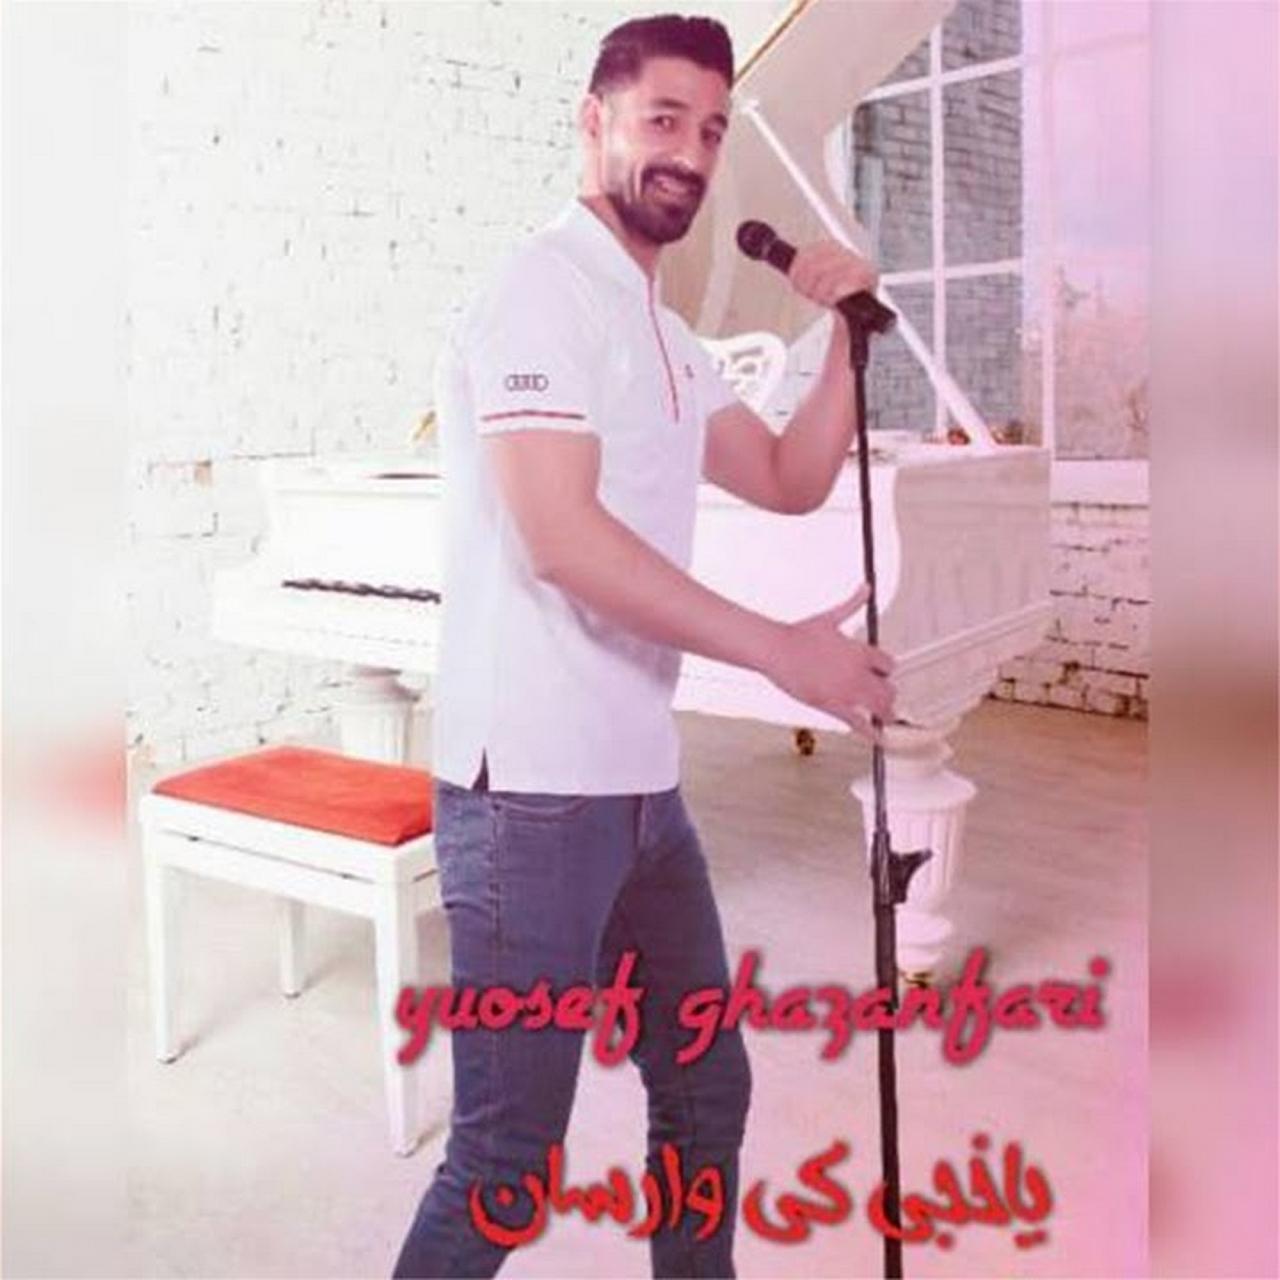 https://s19.picofile.com/file/8433586568/20Yousef_Ghazanfari_Yaxci_Ki_Varsan.jpg